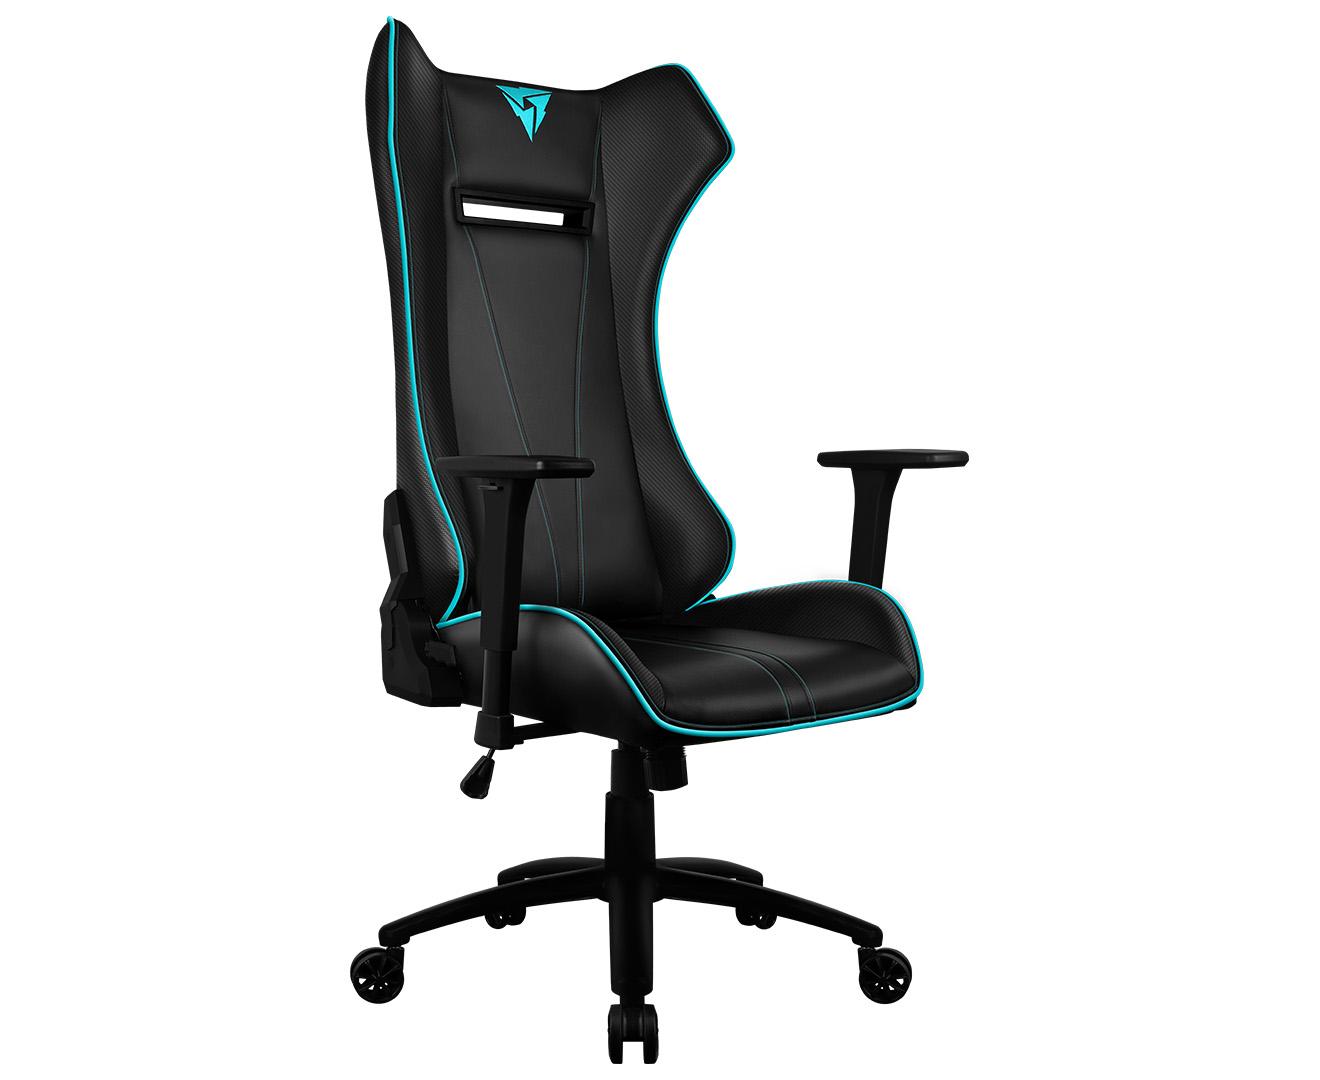 office chair rowing east coast and barstool reviews thunderx3 uc5 hex rgb lighting gaming black cyan